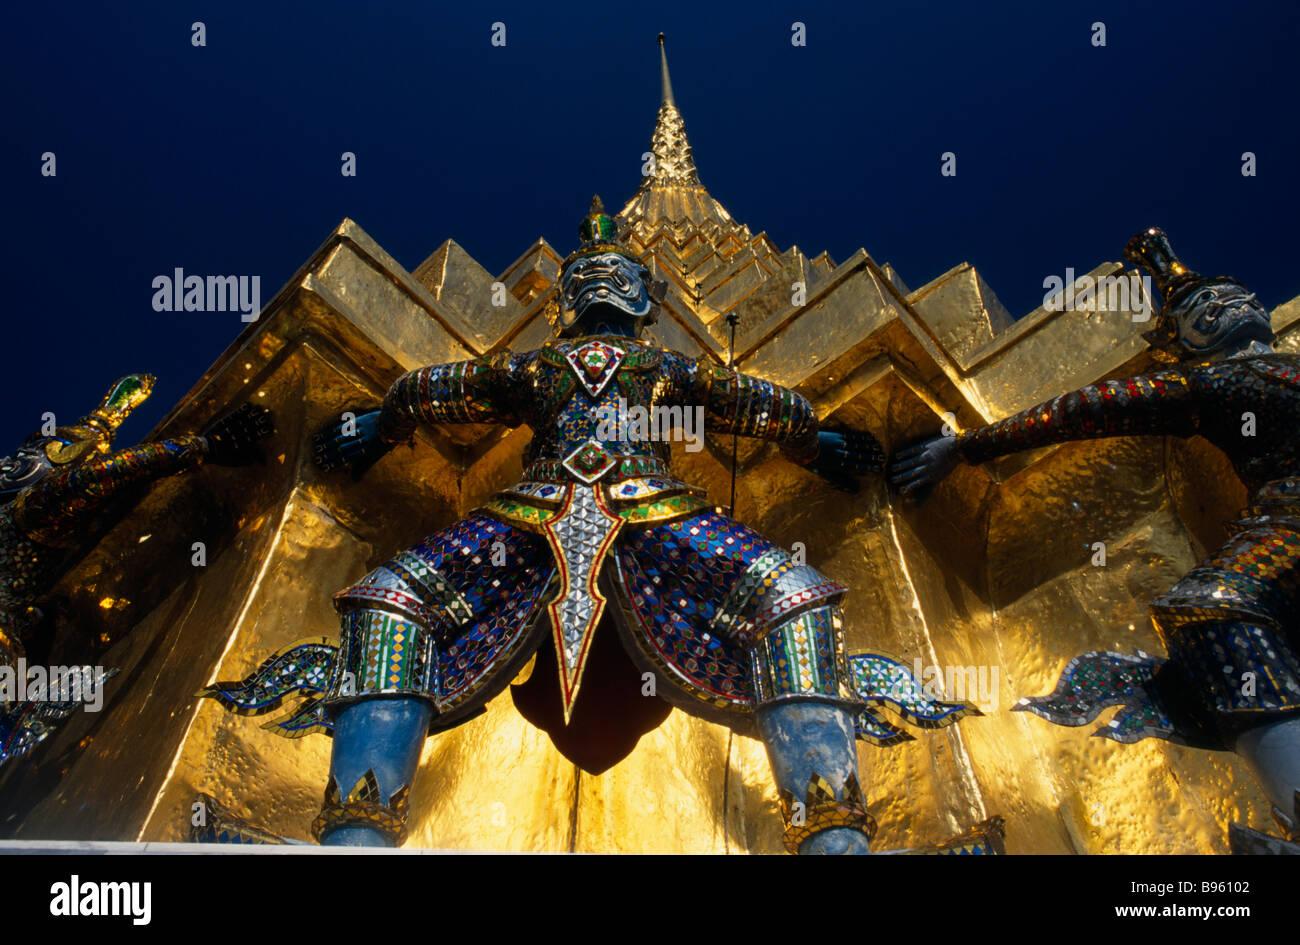 THAILAND Südostasien Bangkok Grand Palace Dämon Statue am Fuße der Golden spire oder prang. Stockbild